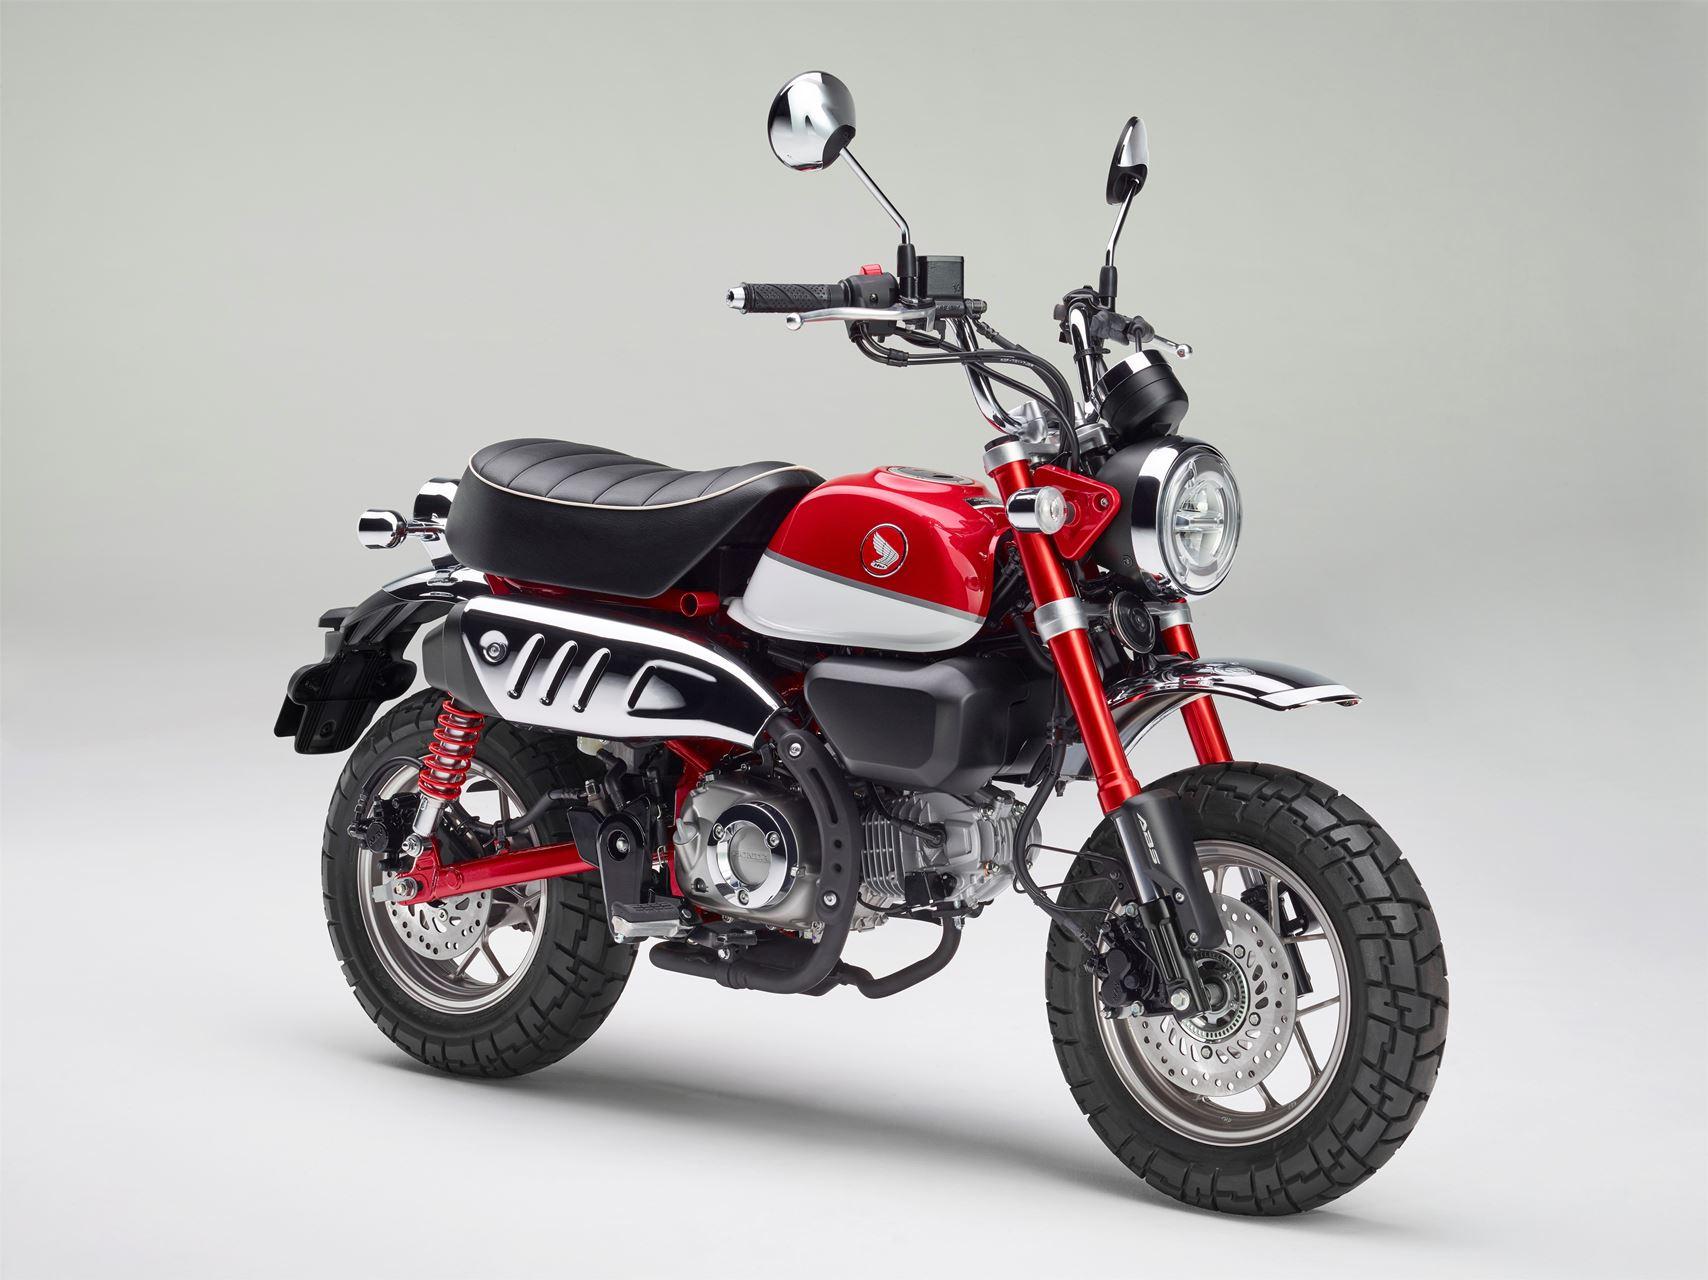 honda monkey 2018 moto motos 125cc andar de moto. Black Bedroom Furniture Sets. Home Design Ideas